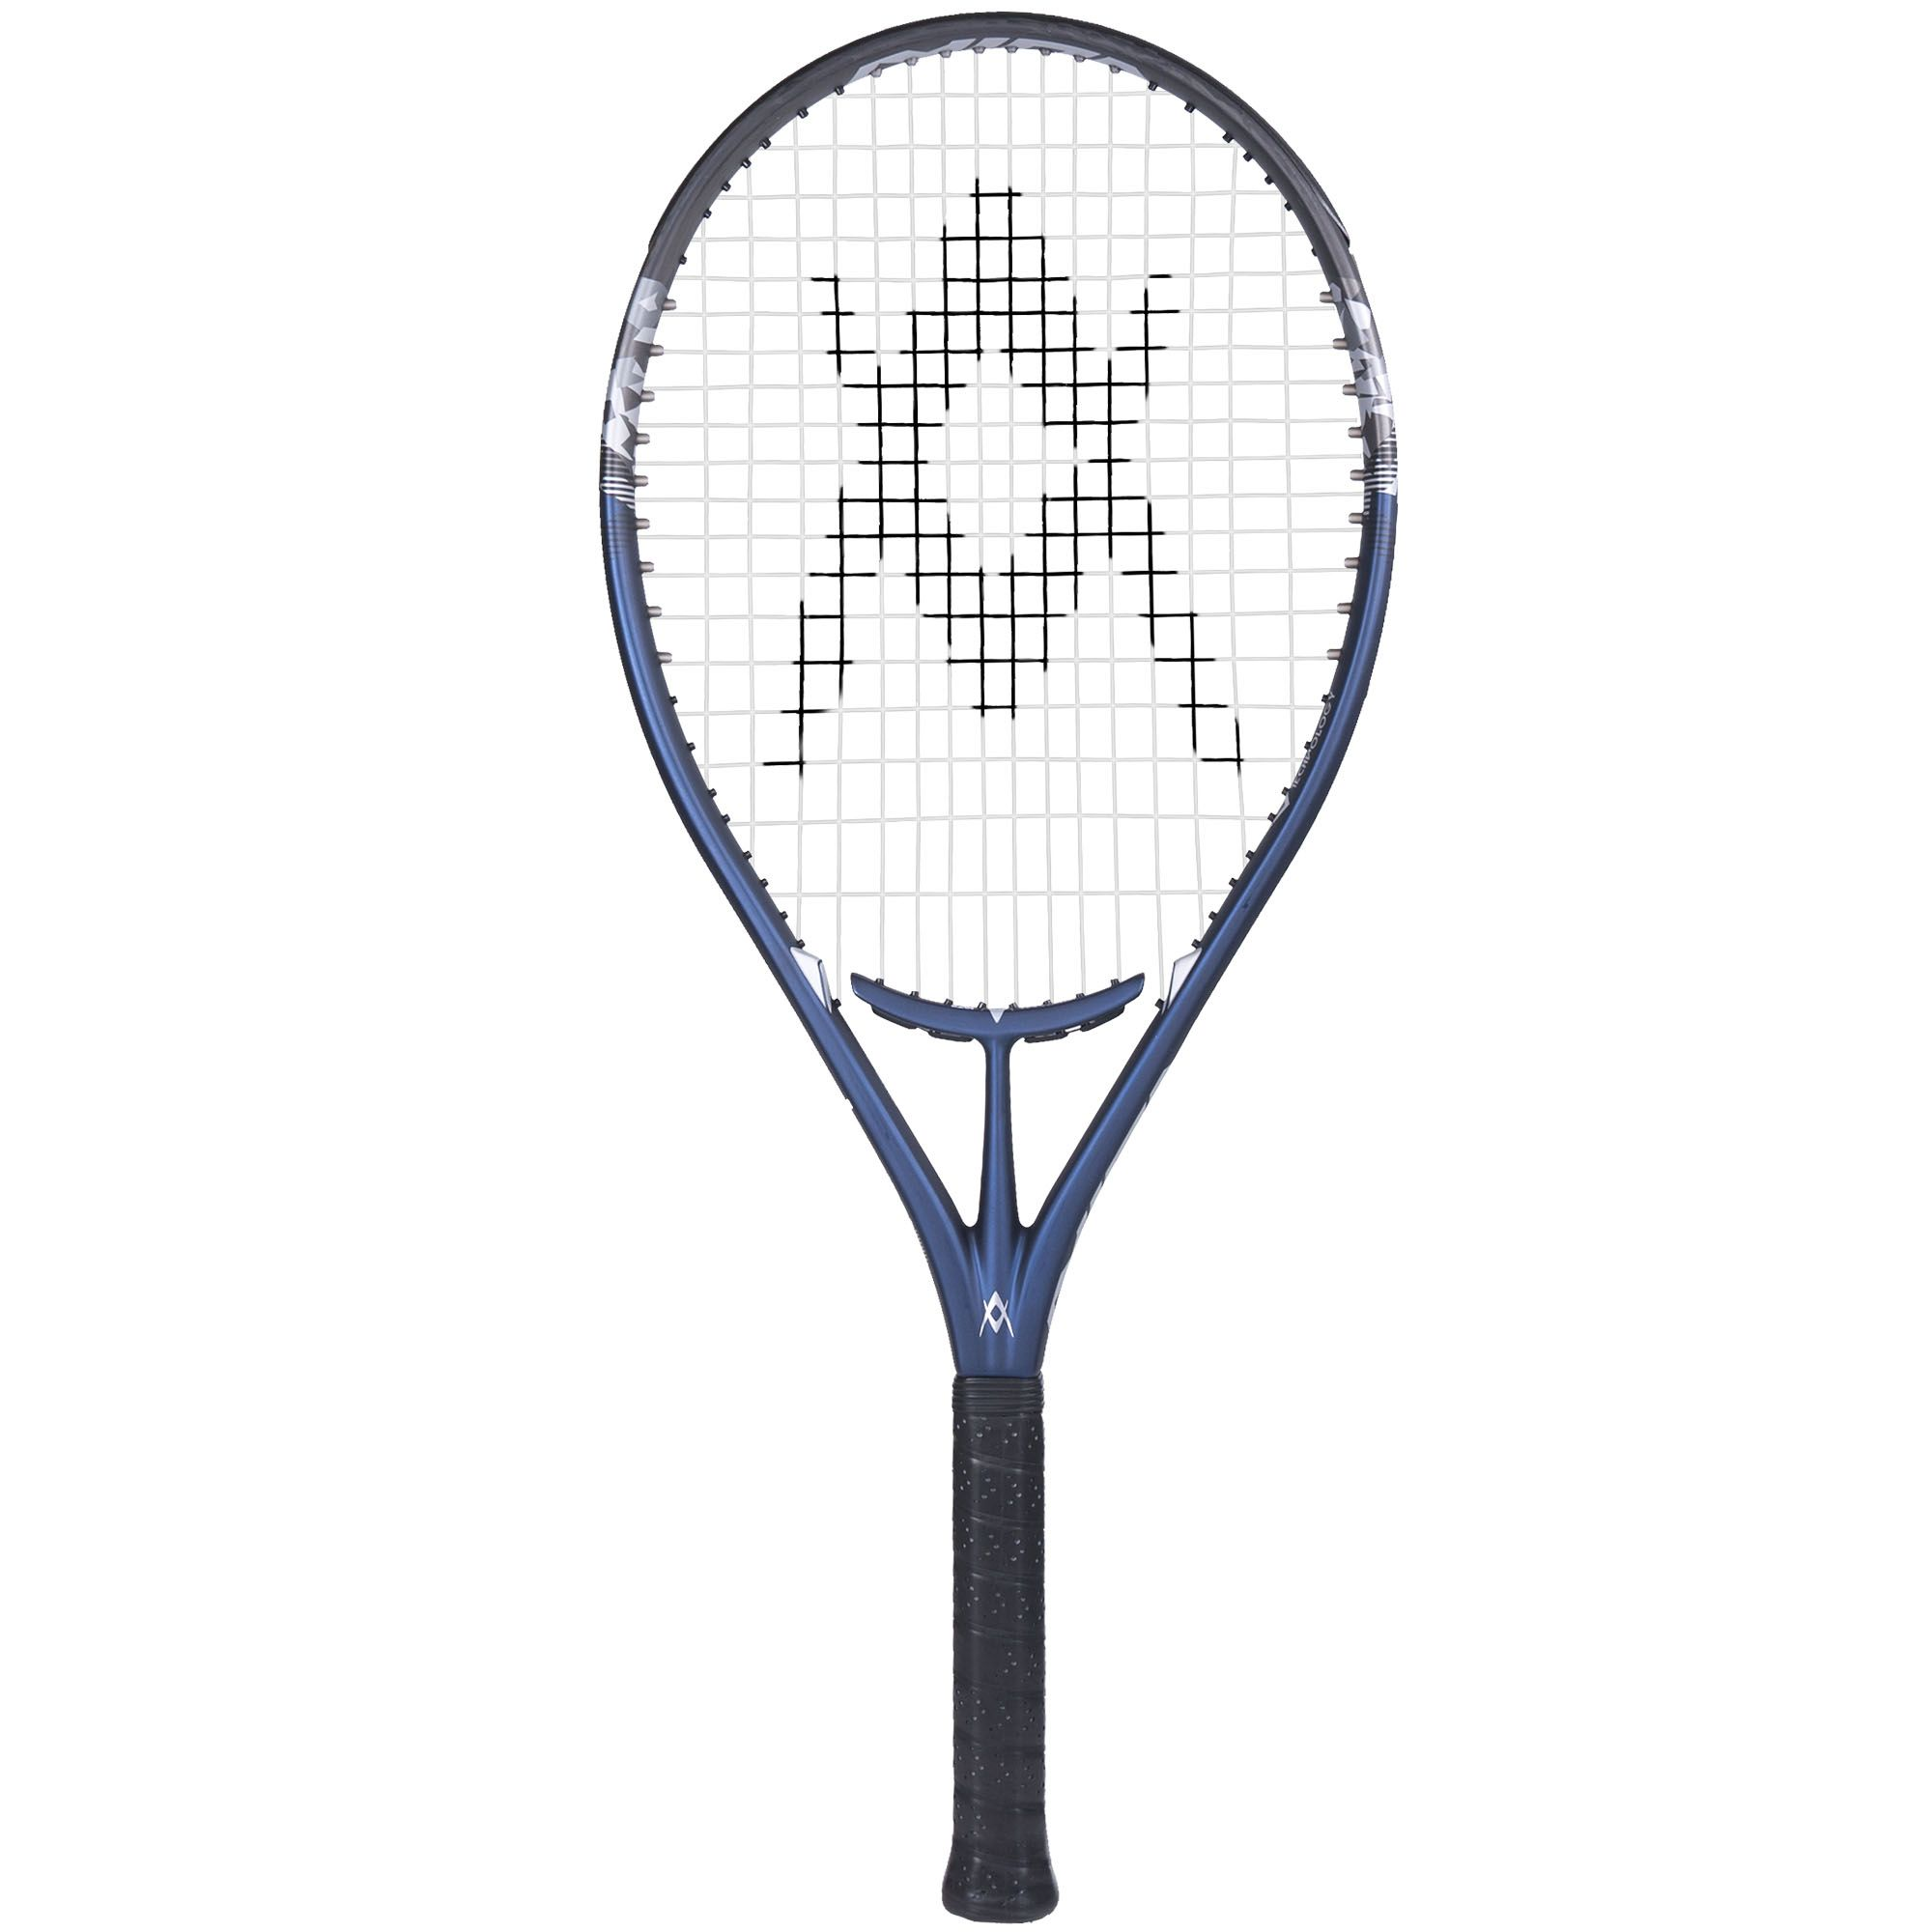 Volkl V-Sense 1 Tennis Racket